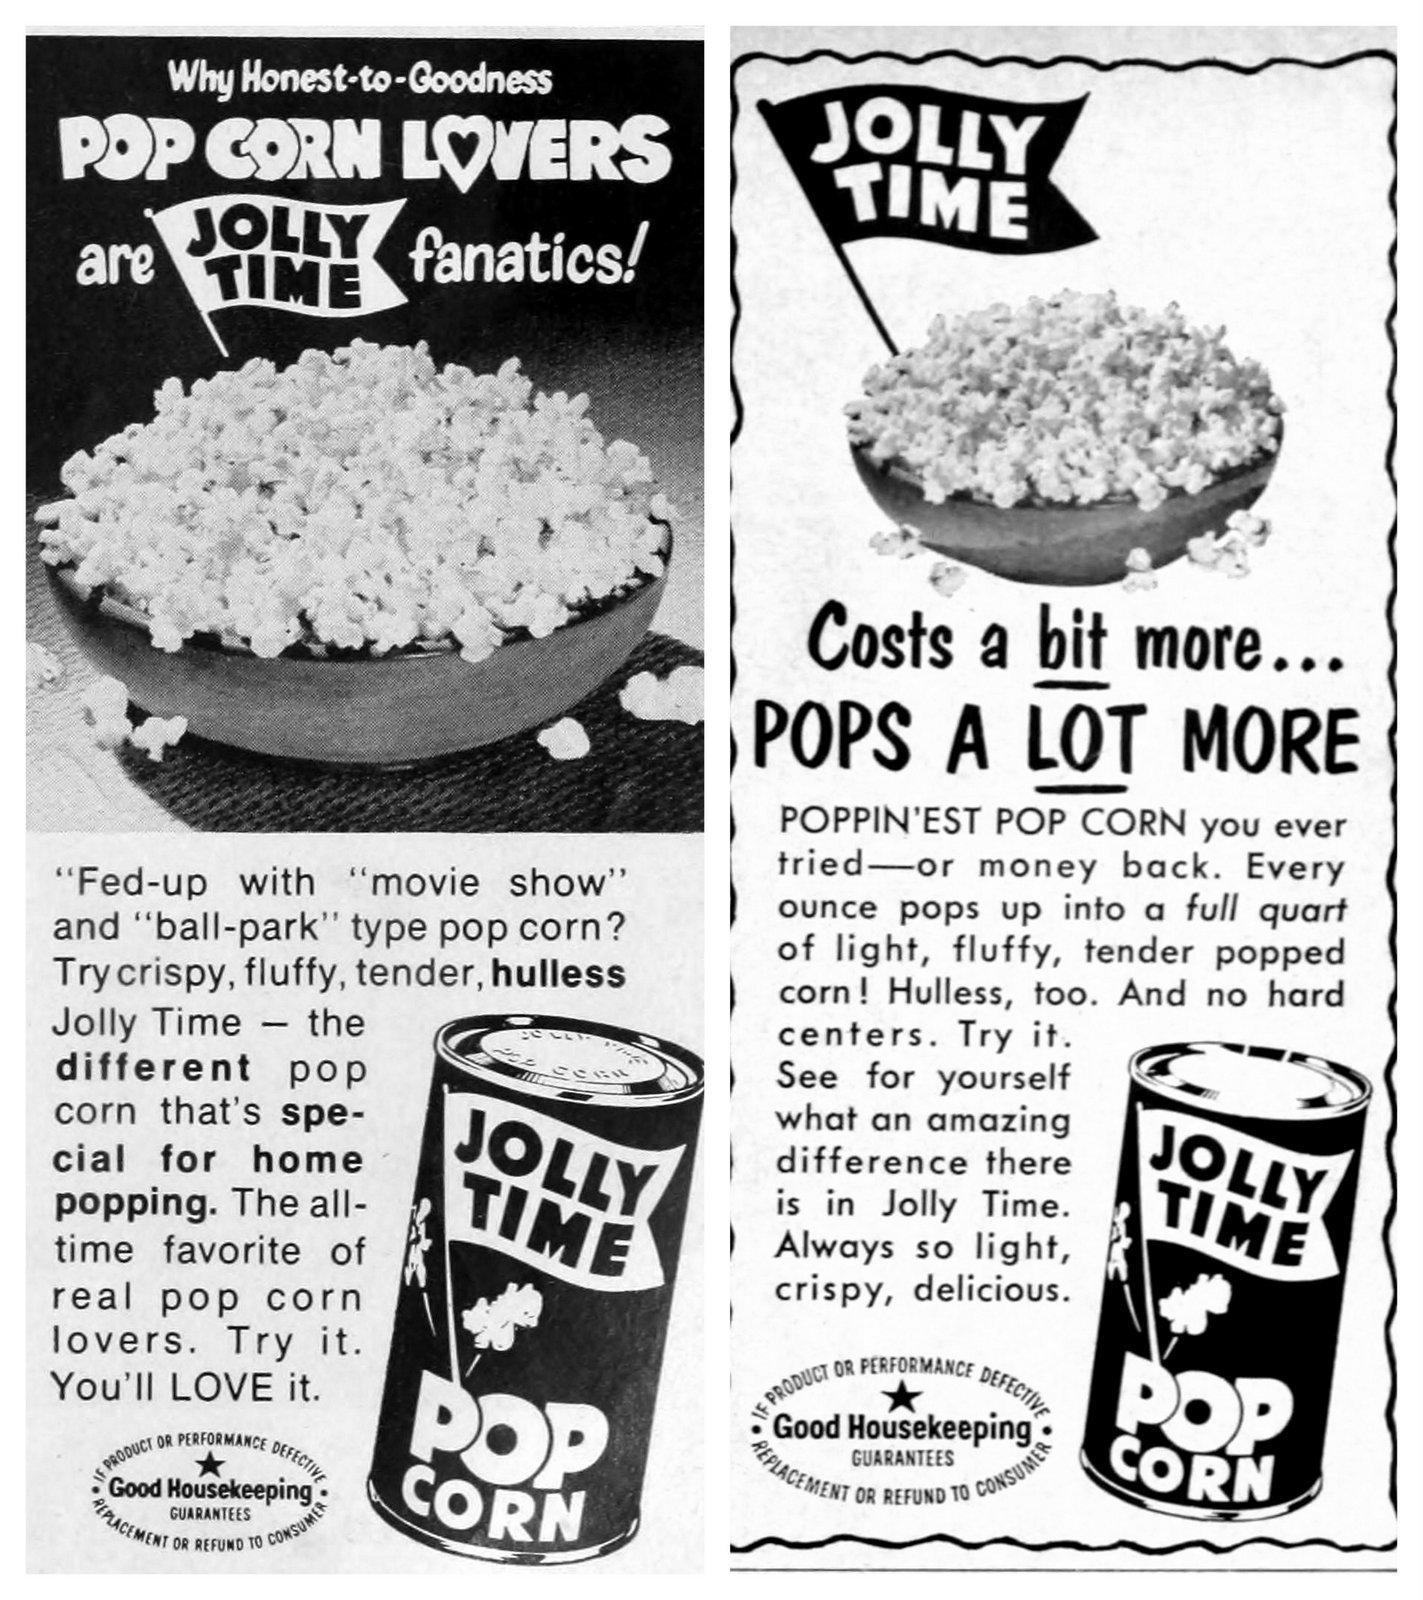 Vintage Jolly Time popcorn ads (late 1960s)